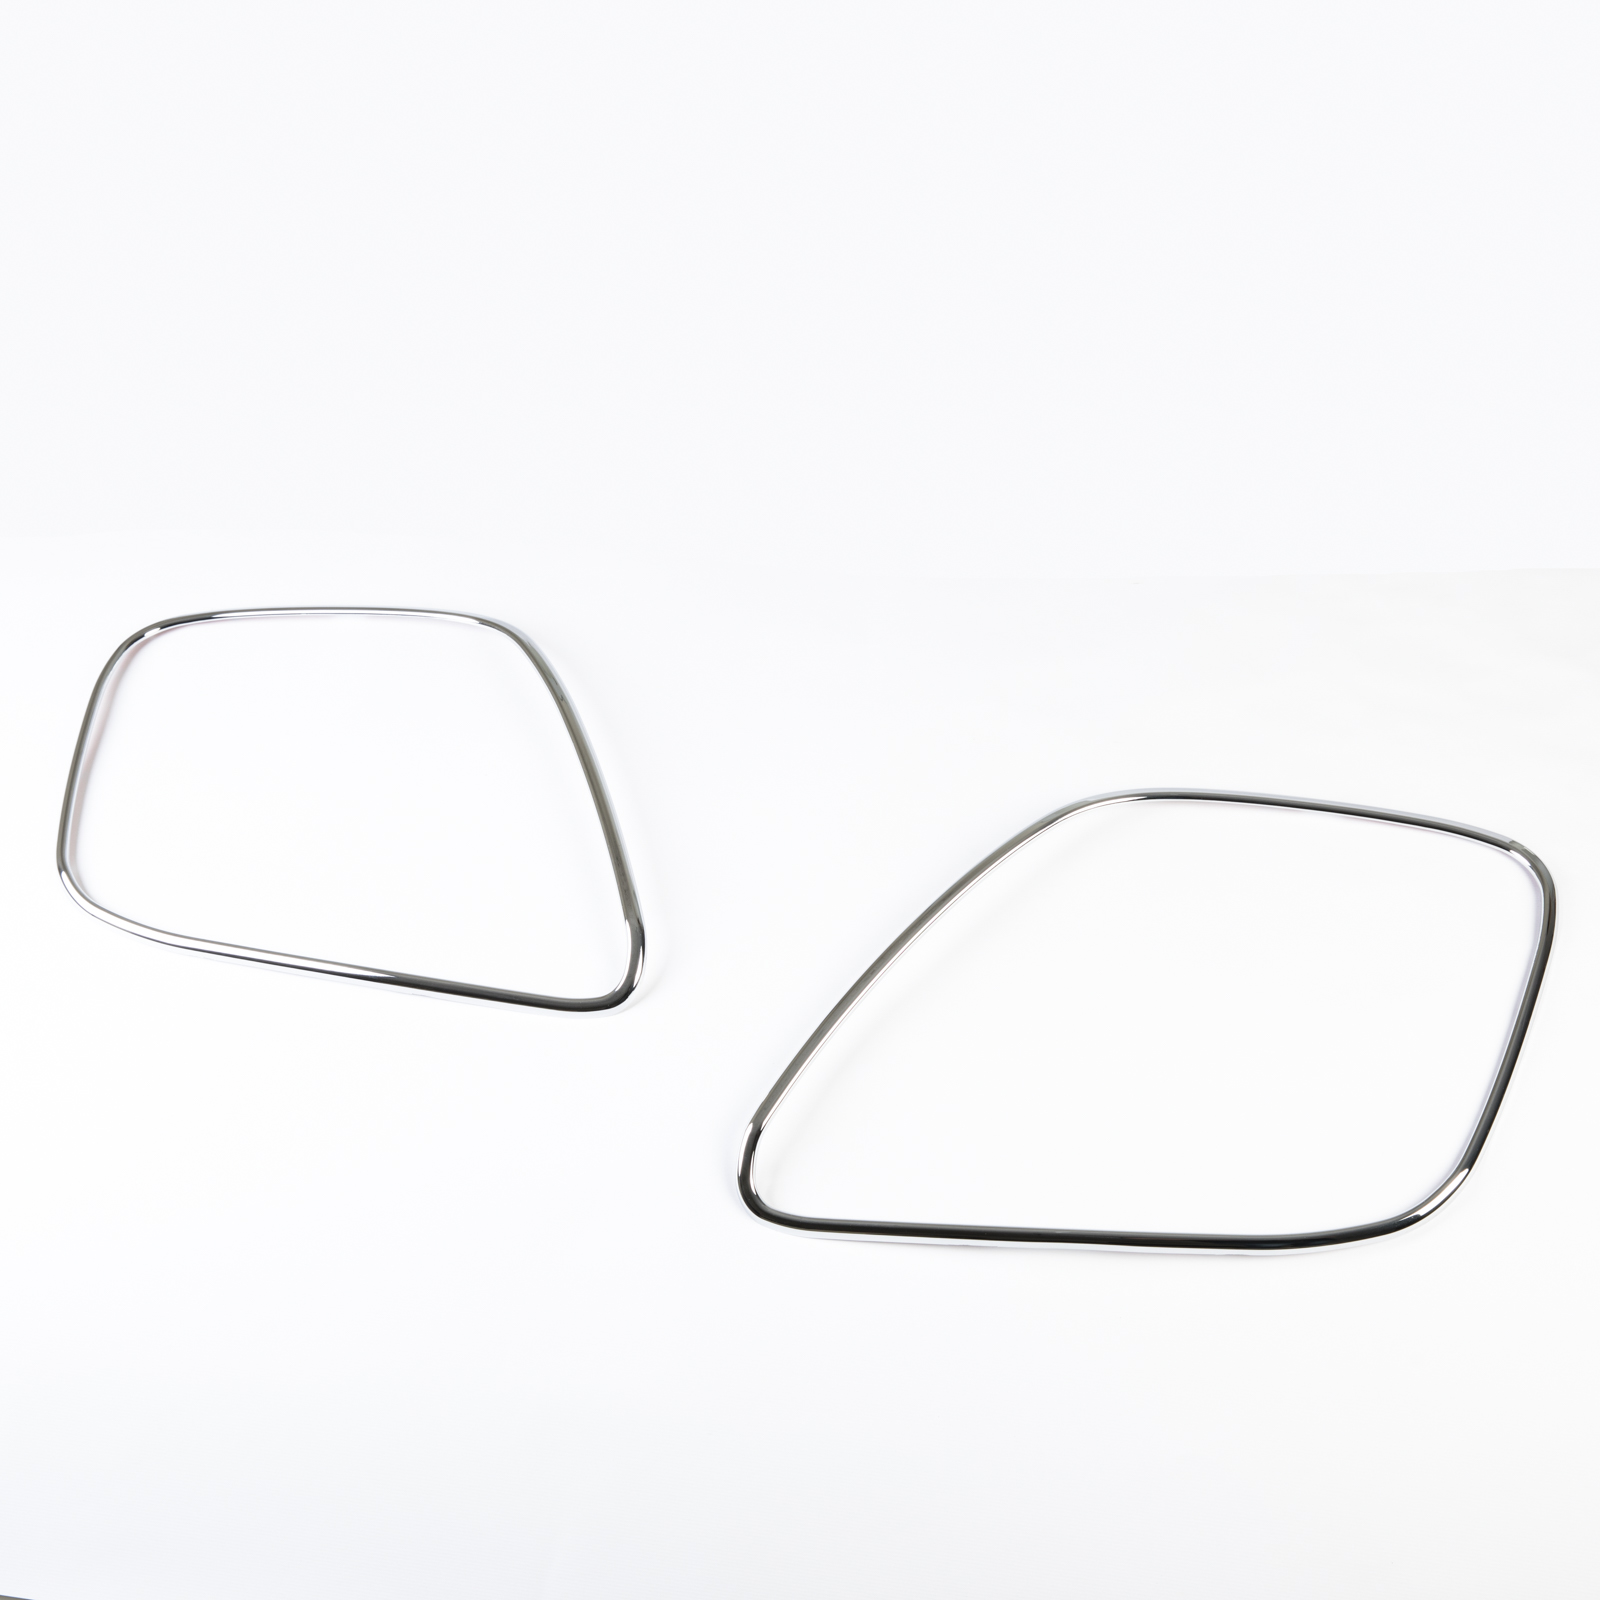 Chrome Tail Light Trim Bezel Cover For Bentley Continental GT GTC 2D 03-10